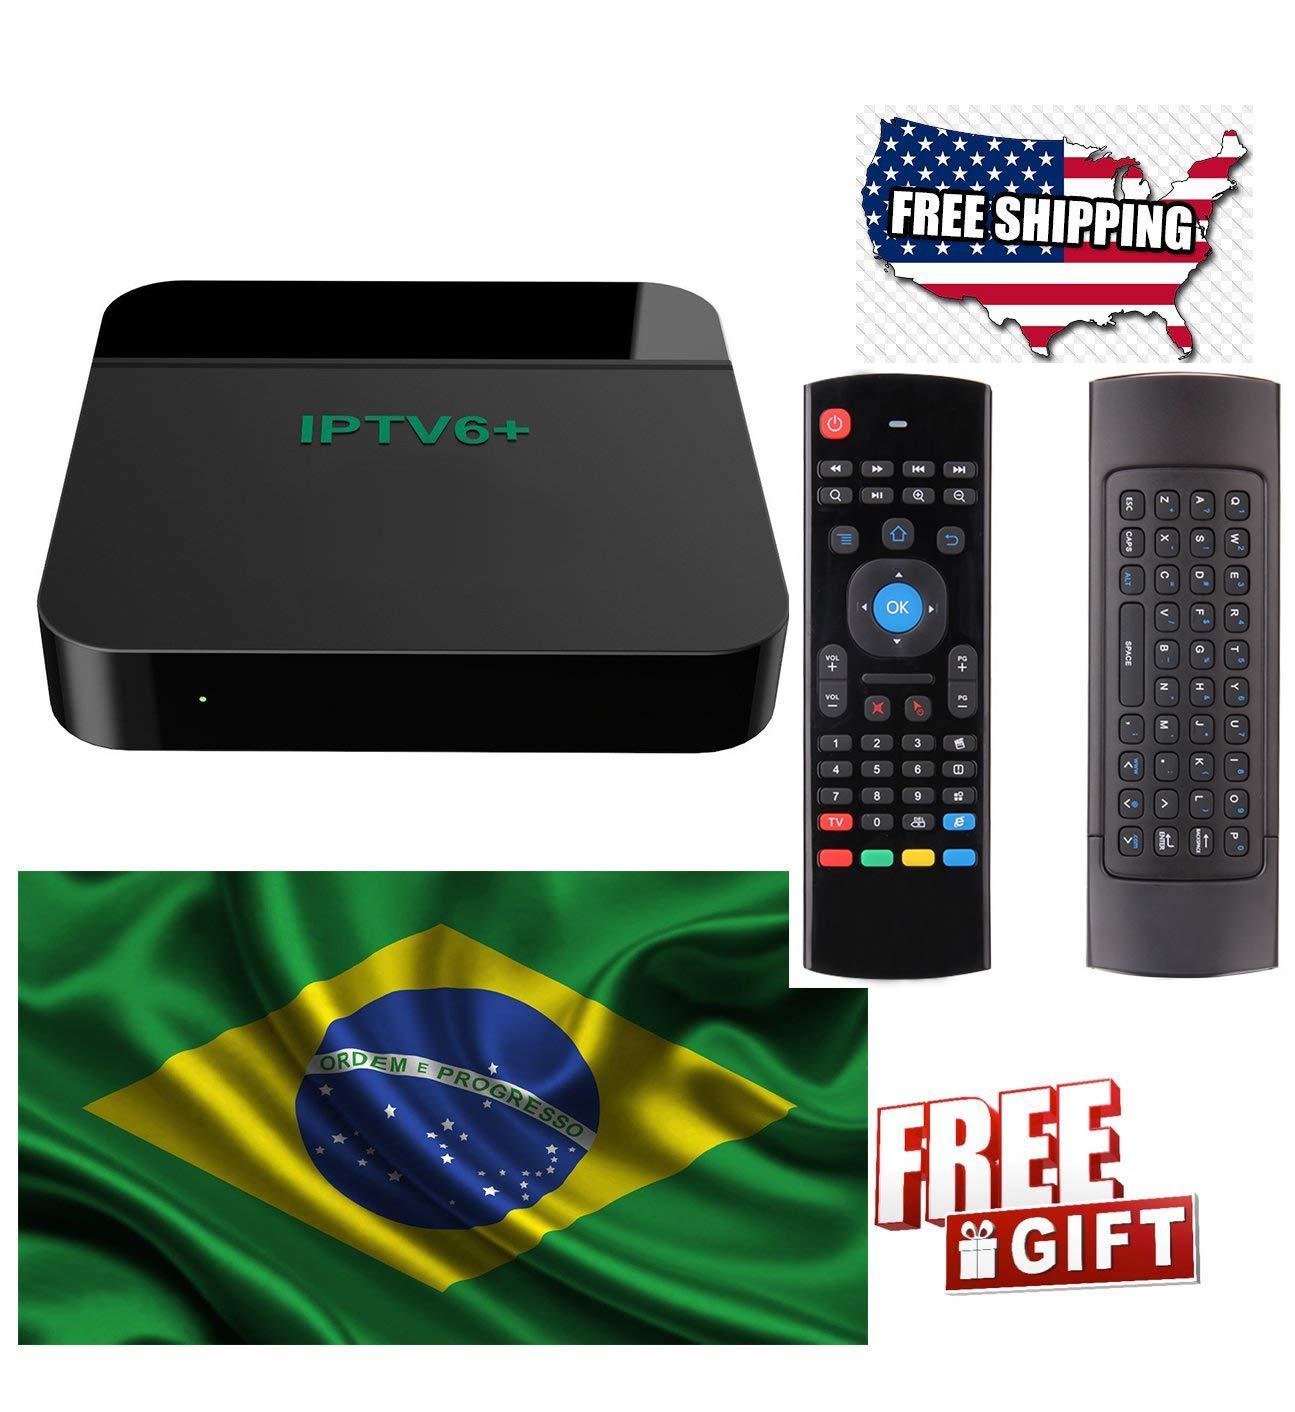 2019 Official IPTV6 Brazil Box Based On HTV6 HTV 6, HTV5 HTV 5 IPTV5 4k canais do Brazil Upgraded, Live Brazilian IP TV Channels, Movies, TV Shows,Best IPTV Brazil,Better Than HTV Box A2,A1,IPTVKINGS